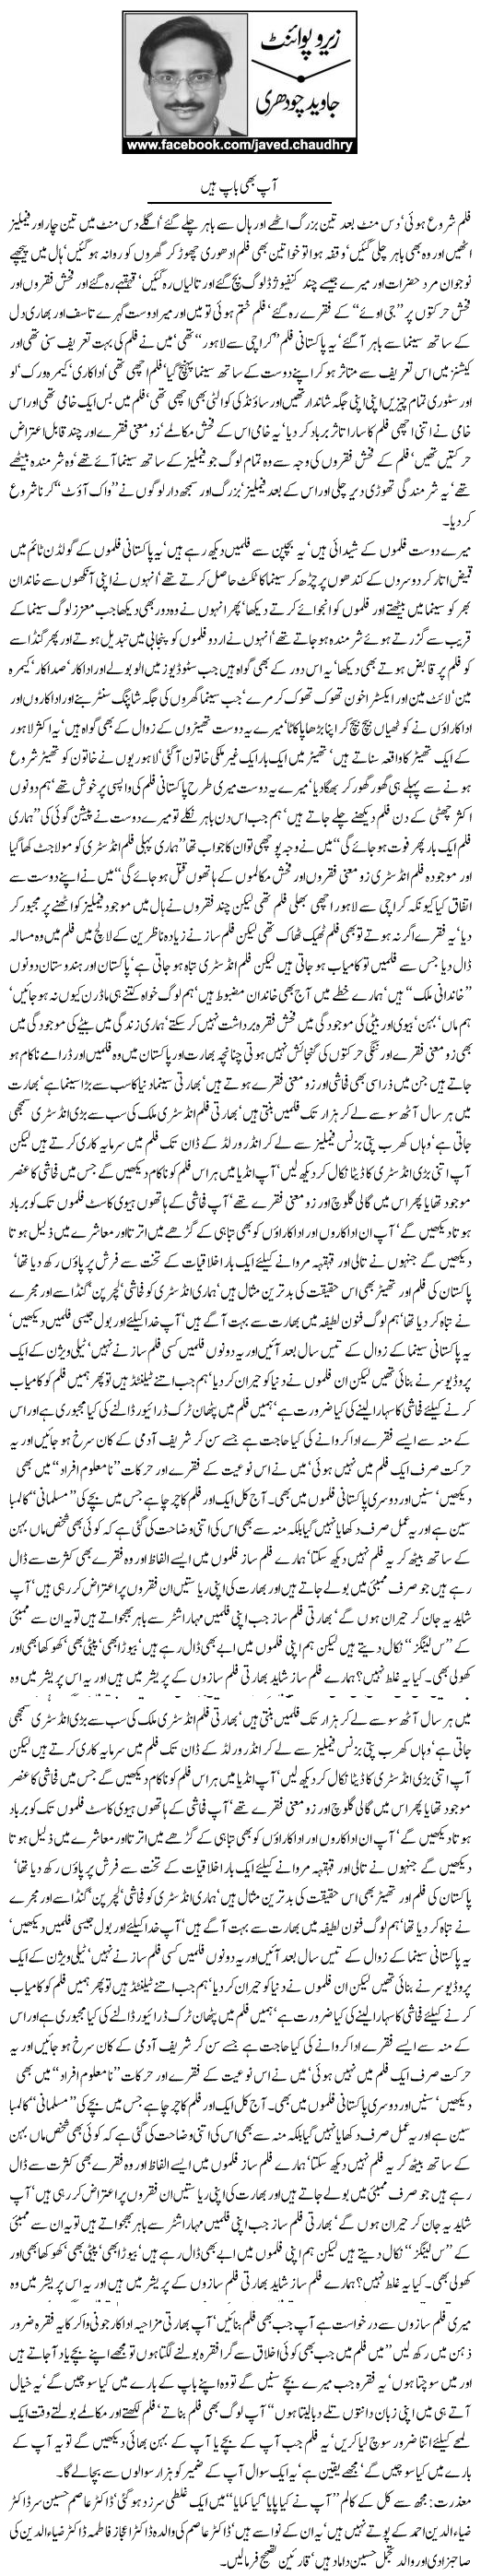 Javed Chaudhry Column | Aap Bhi Baap Hen | Zero Point